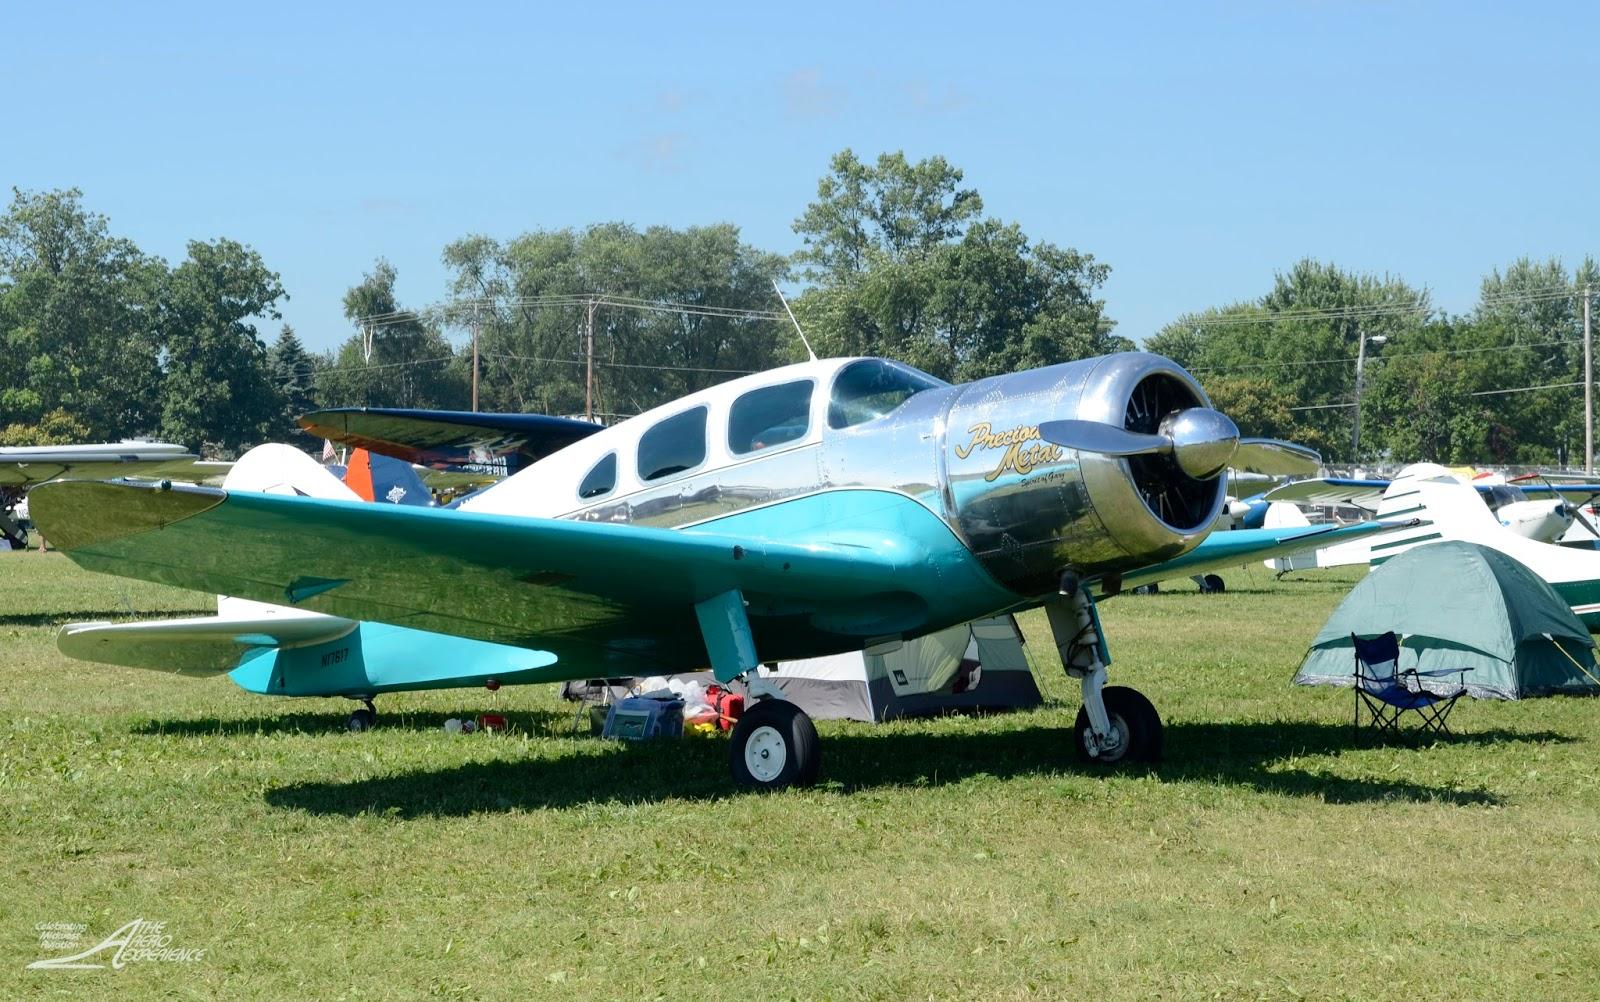 Vintage Aircraft | The Air Above |Vintage Jet Planes